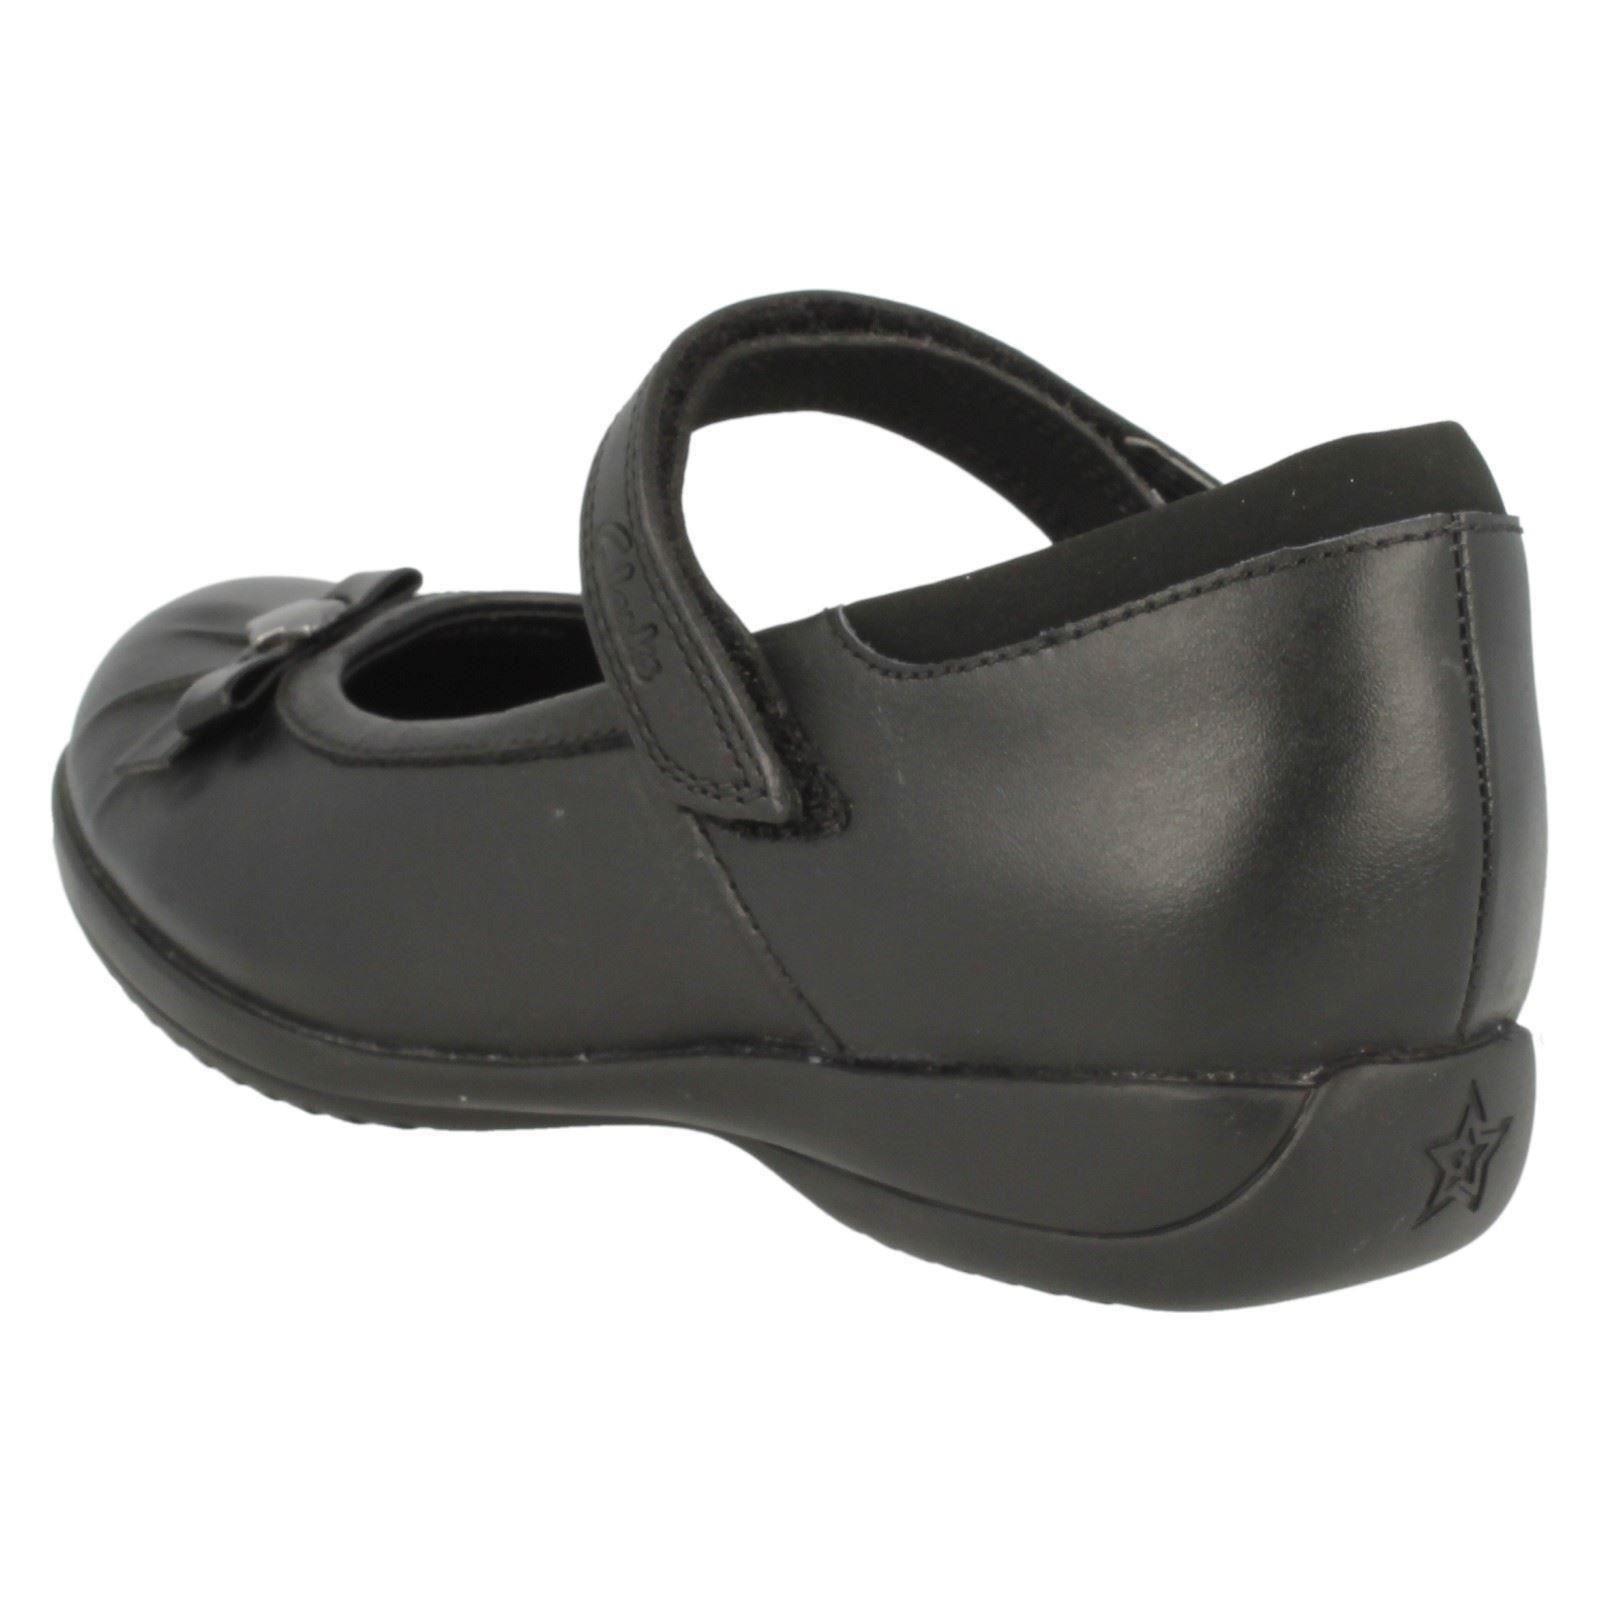 Chicas Clarks Zapatos Escolares Daisy Spark